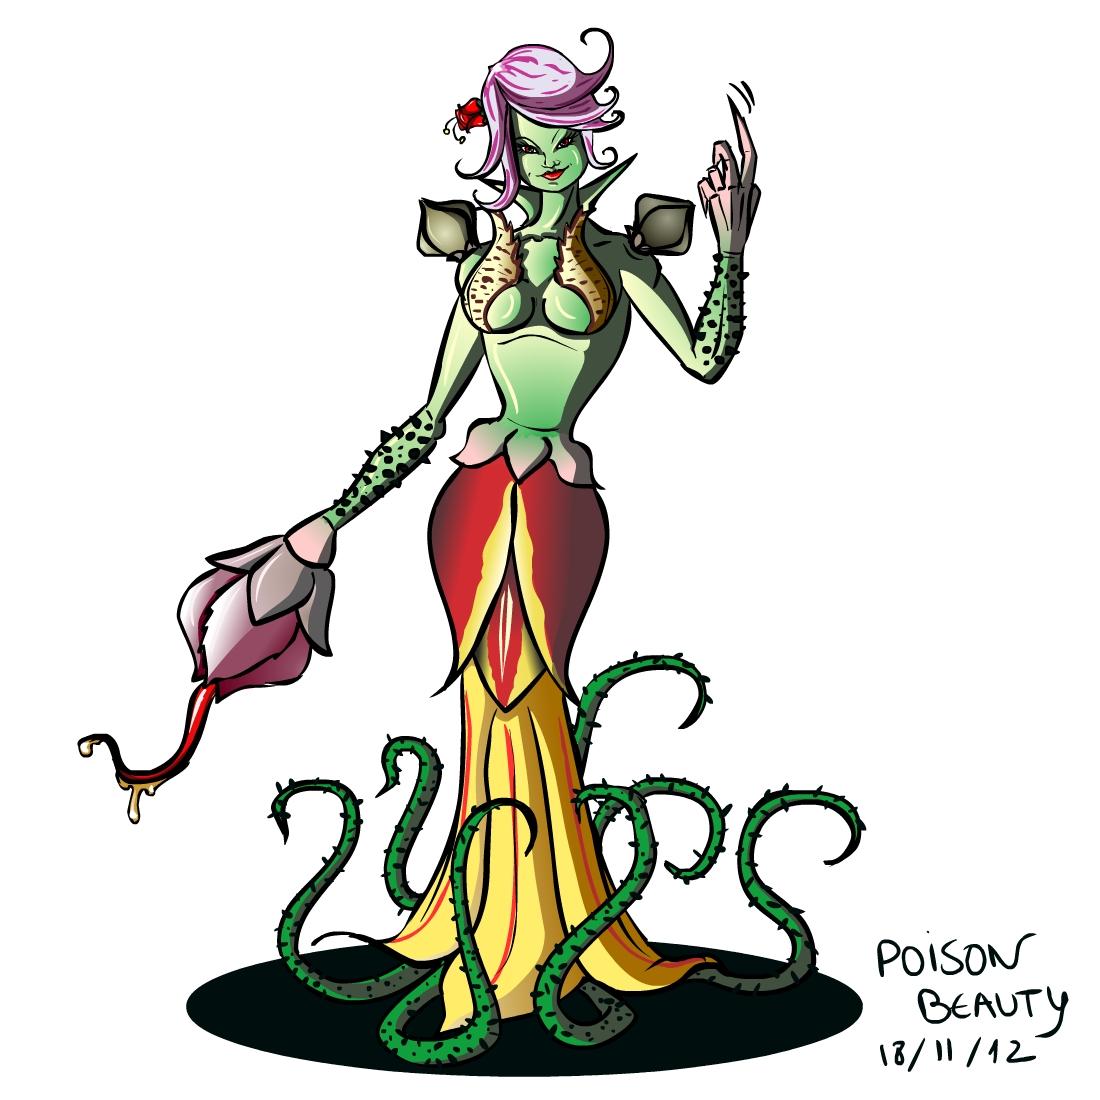 Poison Beauty